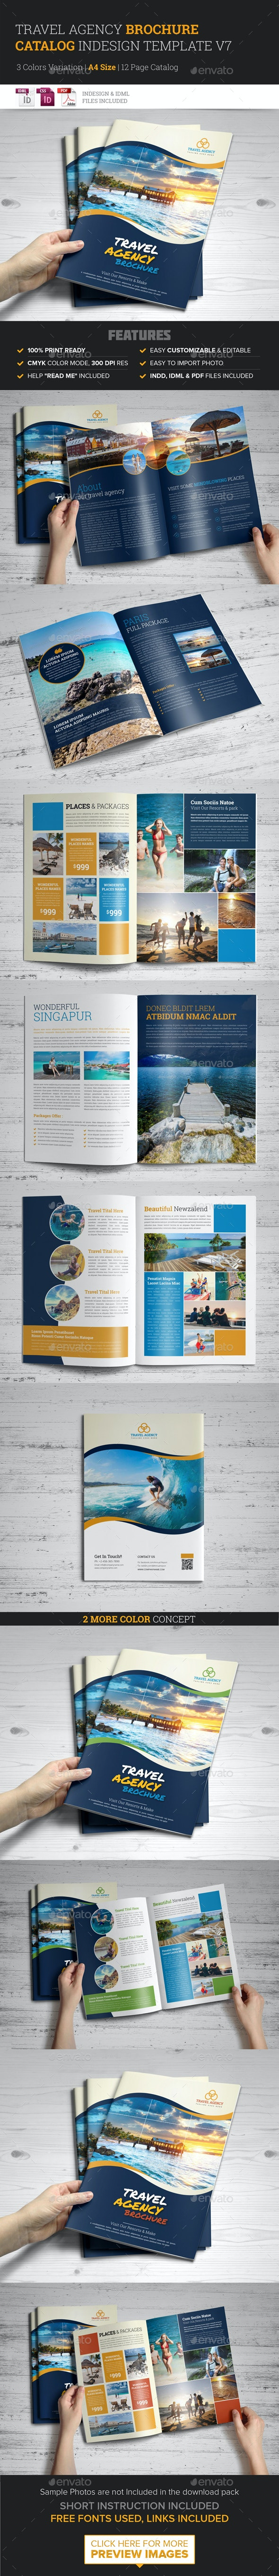 Travel Agency Brochure Catalog InDesign Template v7 - Corporate Brochures